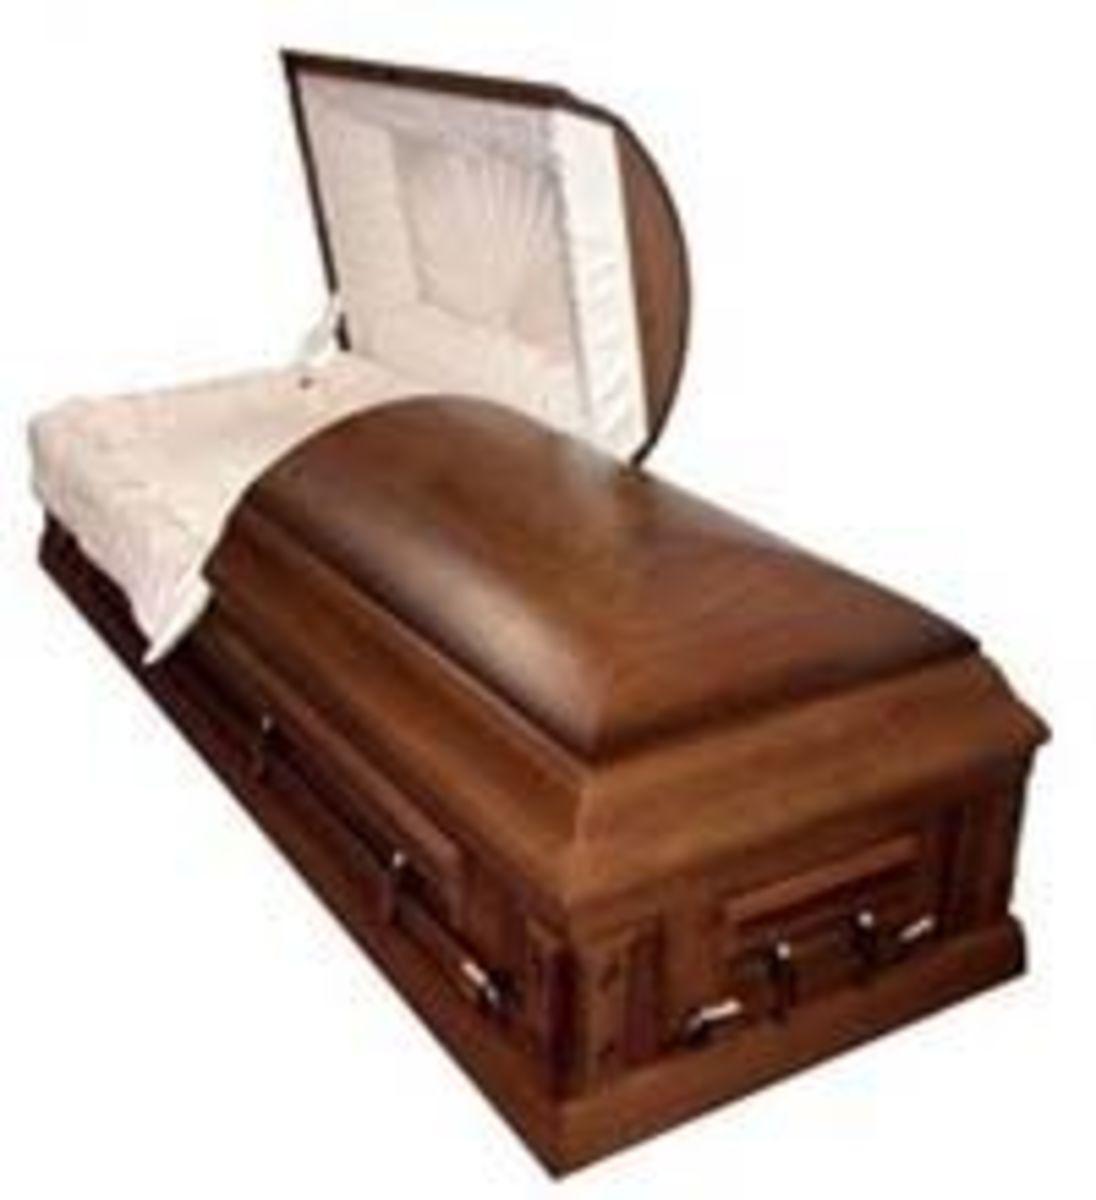 Half-open wood grain casket with white satin lining